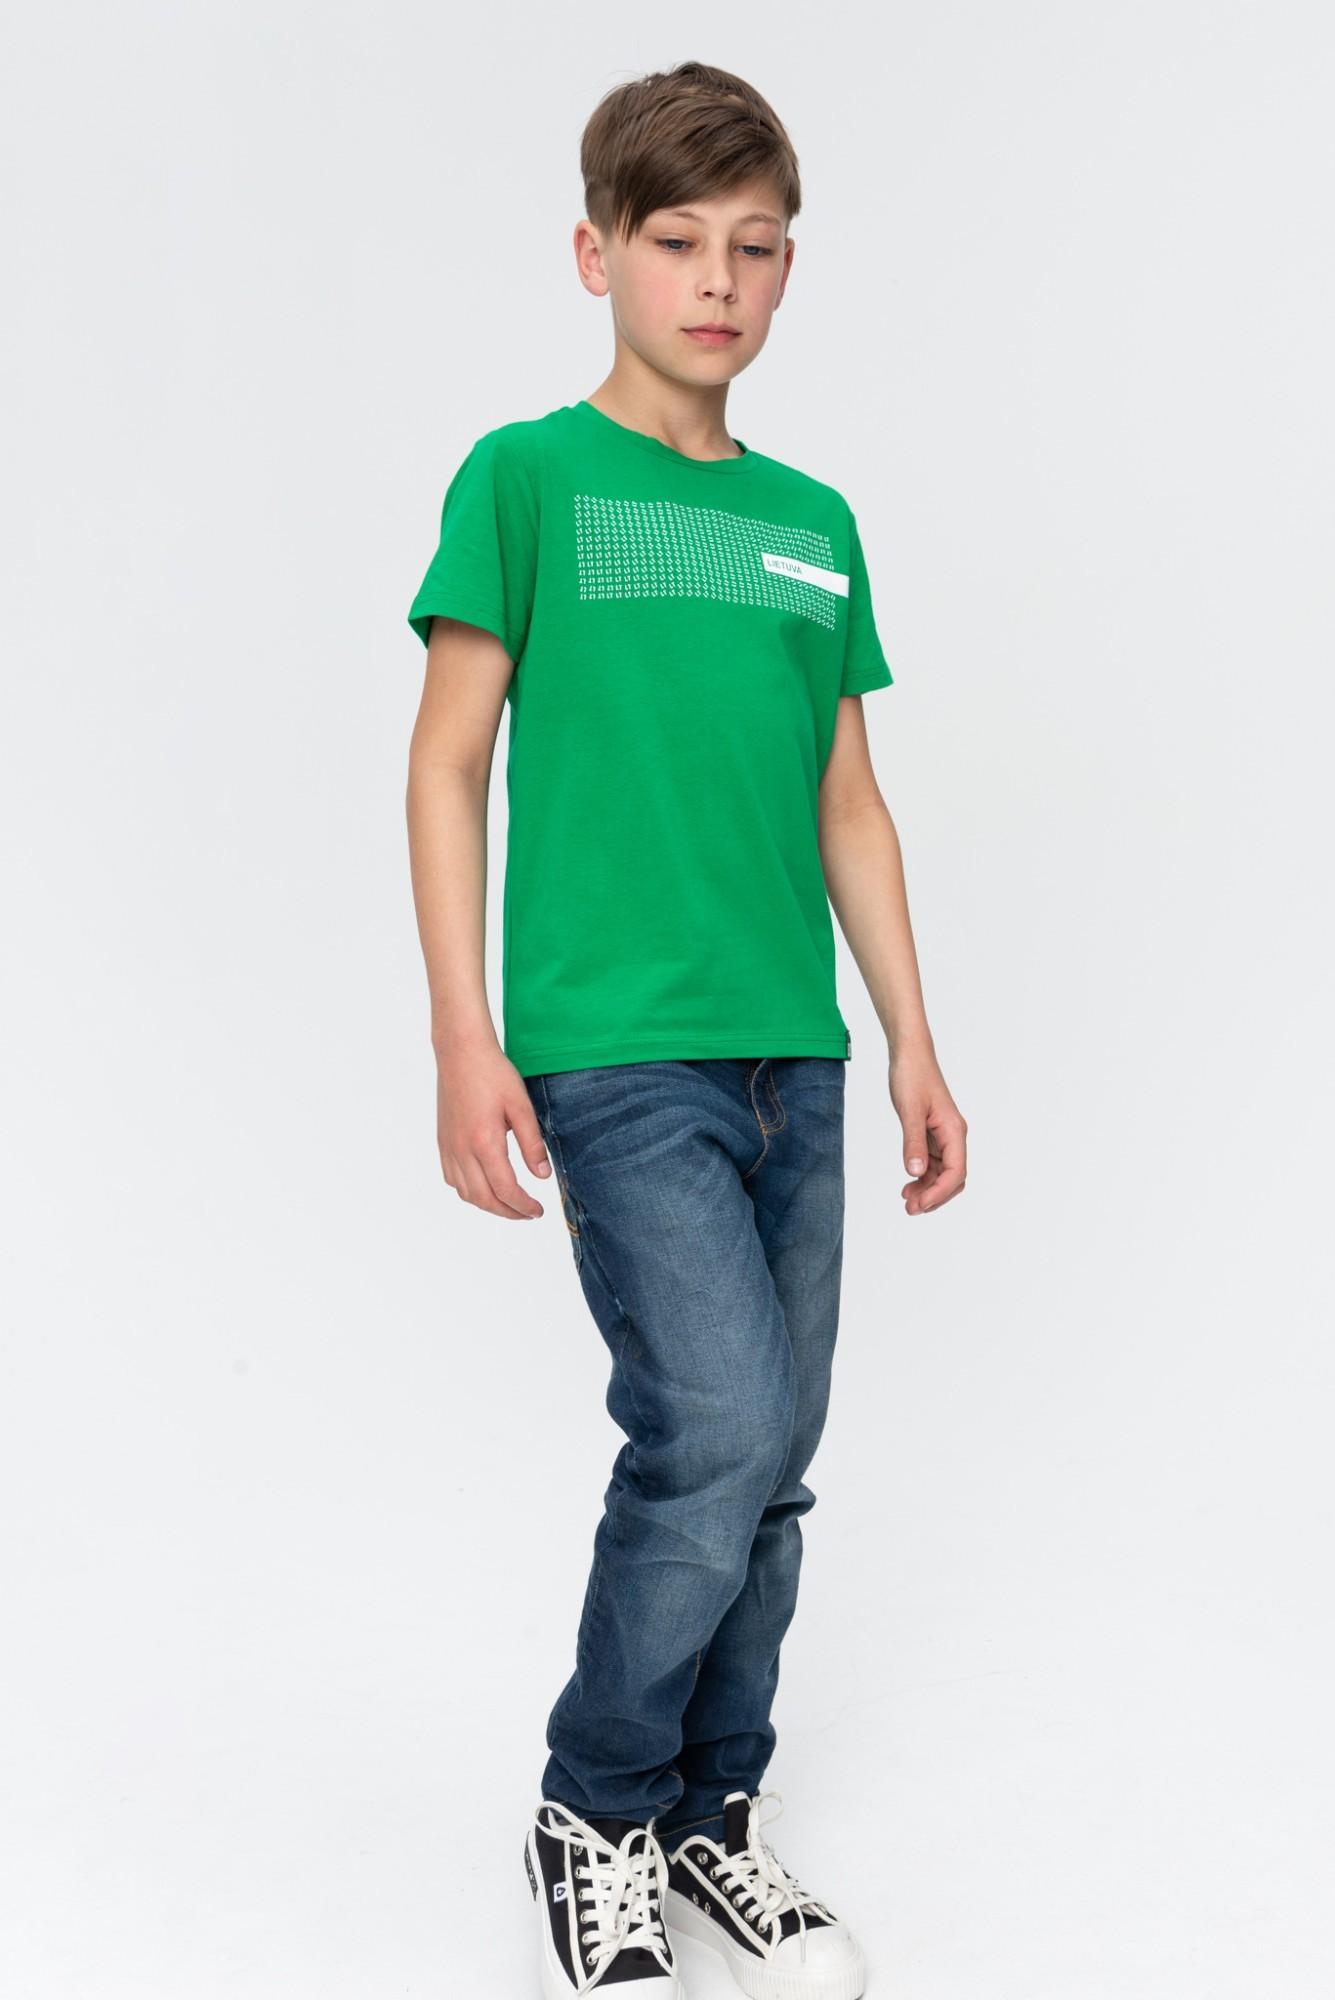 AUDIMAS Marg. medvilniniai marškinėliai 20LT-410 Jolly Green Lt 128